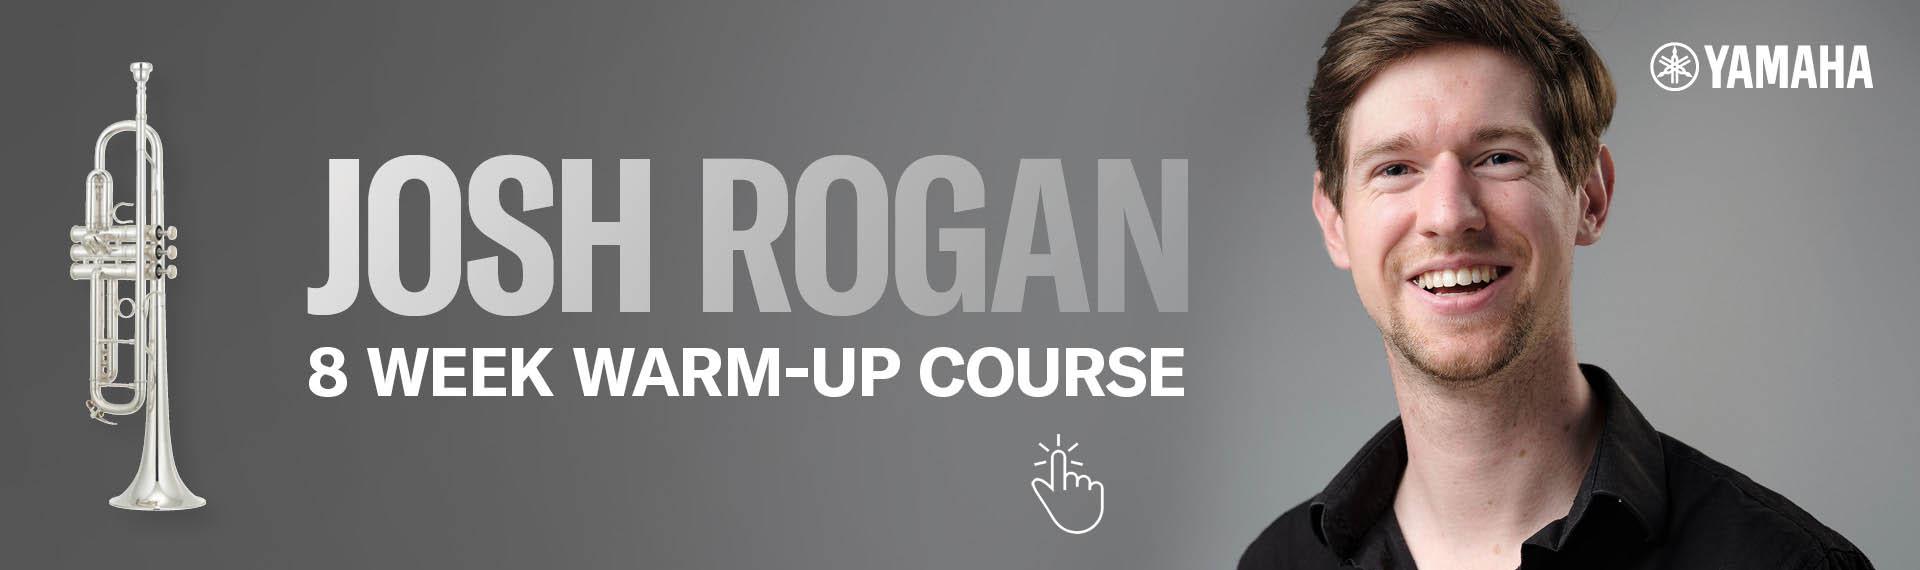 Josh Rogan Warm-Up Course